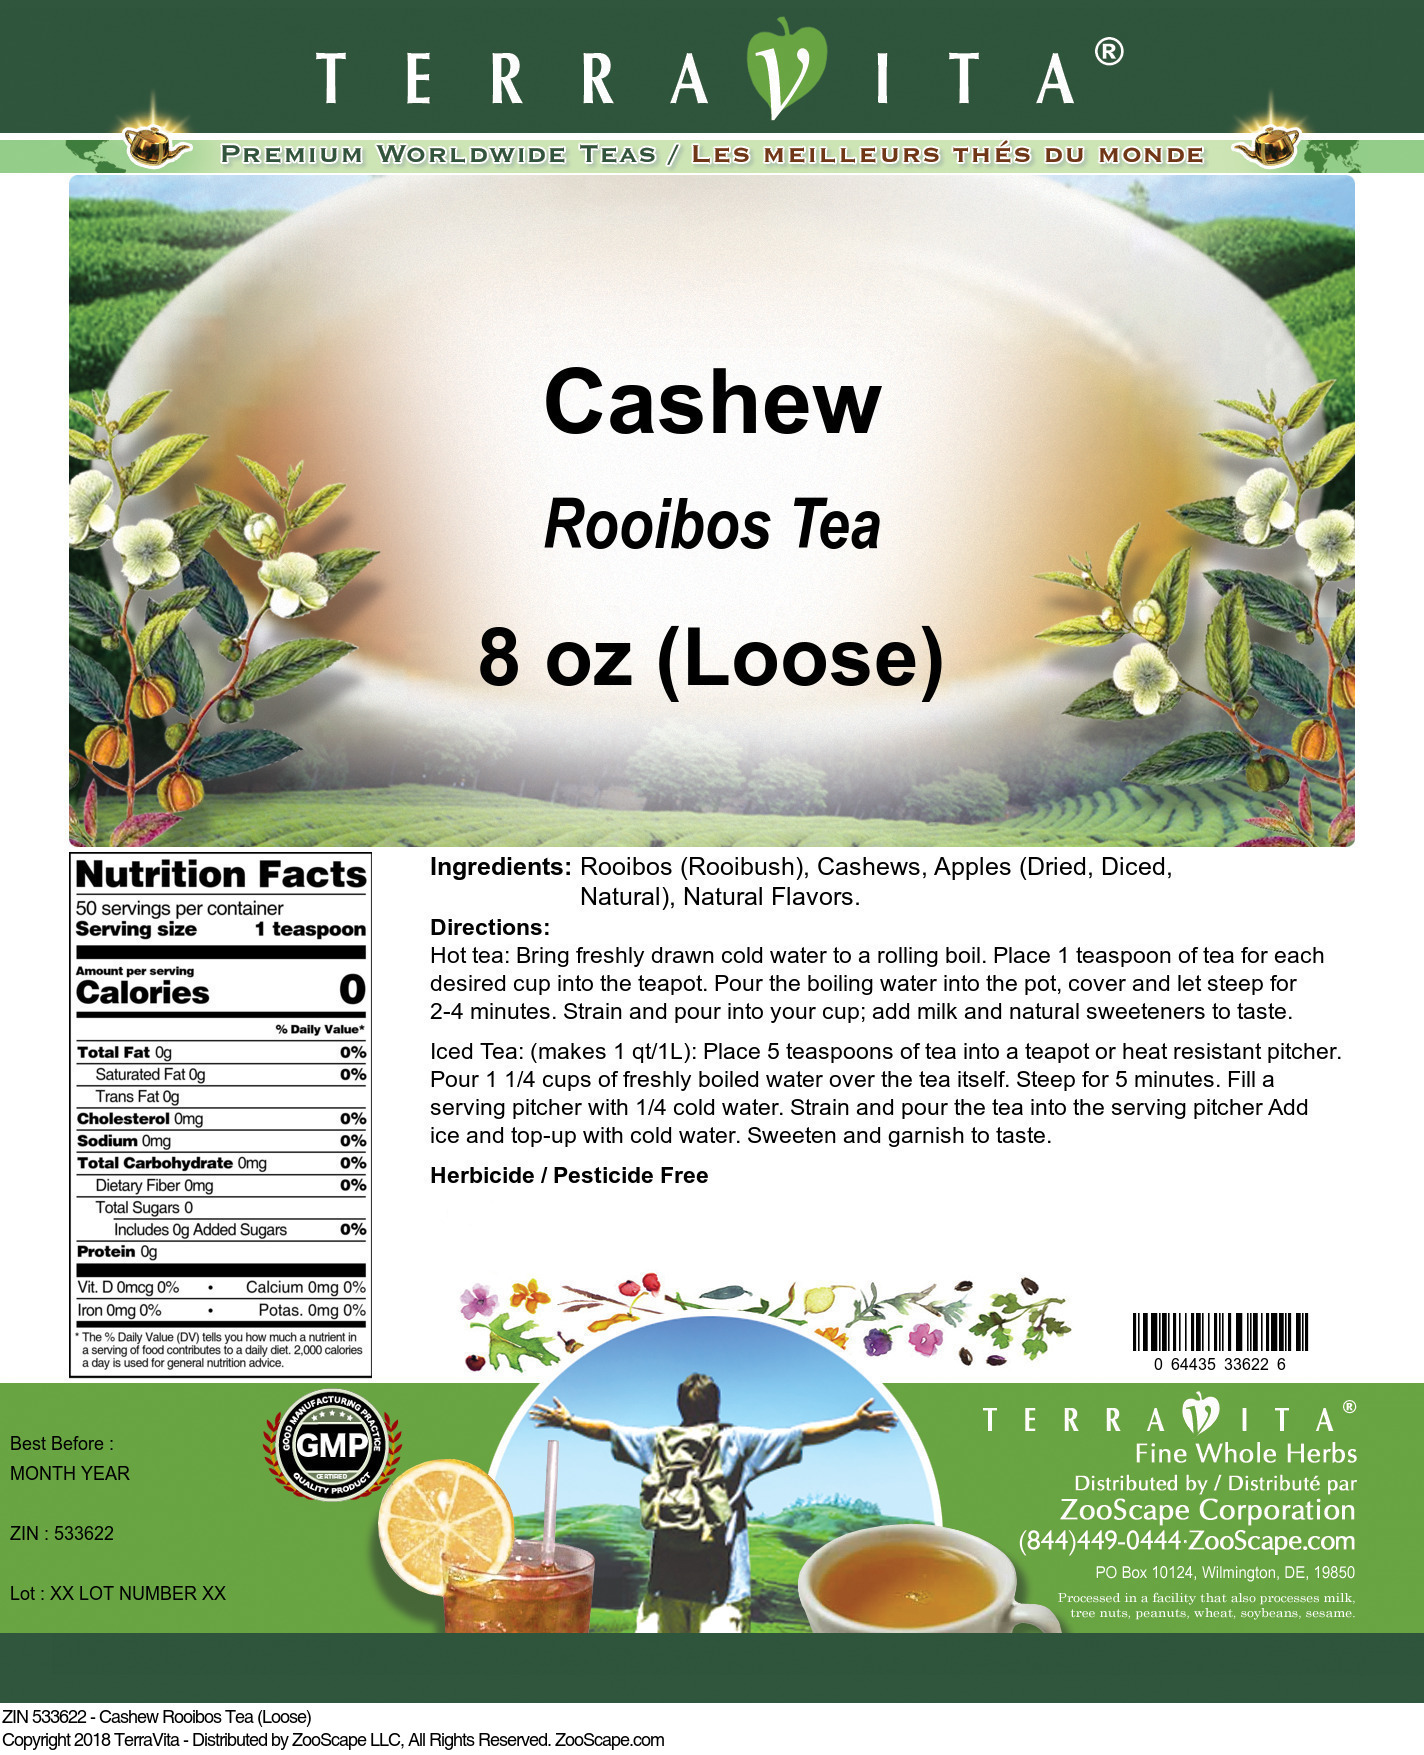 Cashew Rooibos Tea